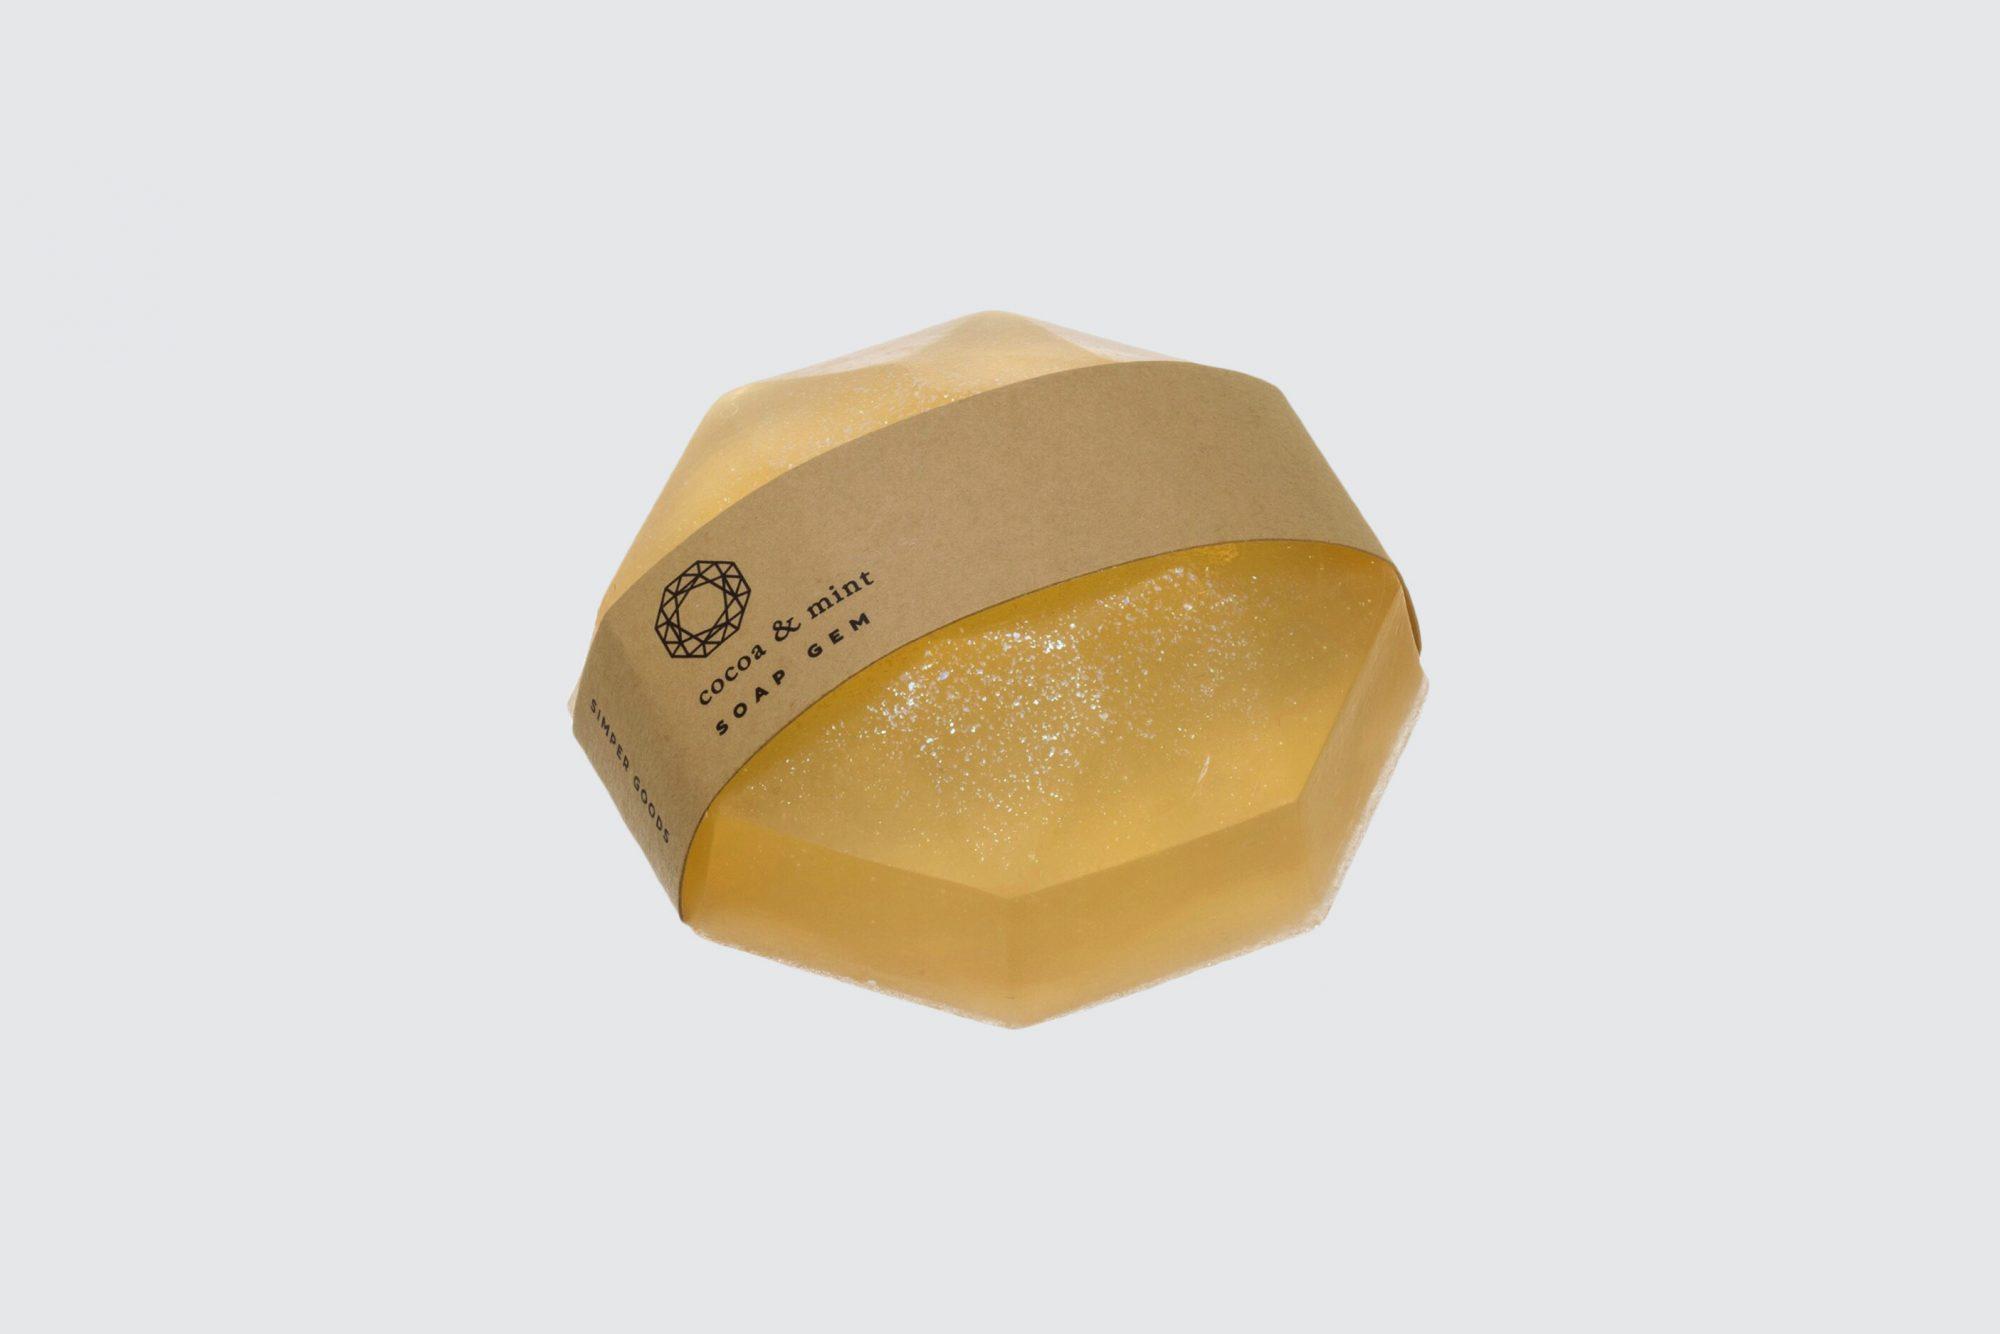 Simper Goods Cocoa and Mint Soap Gem